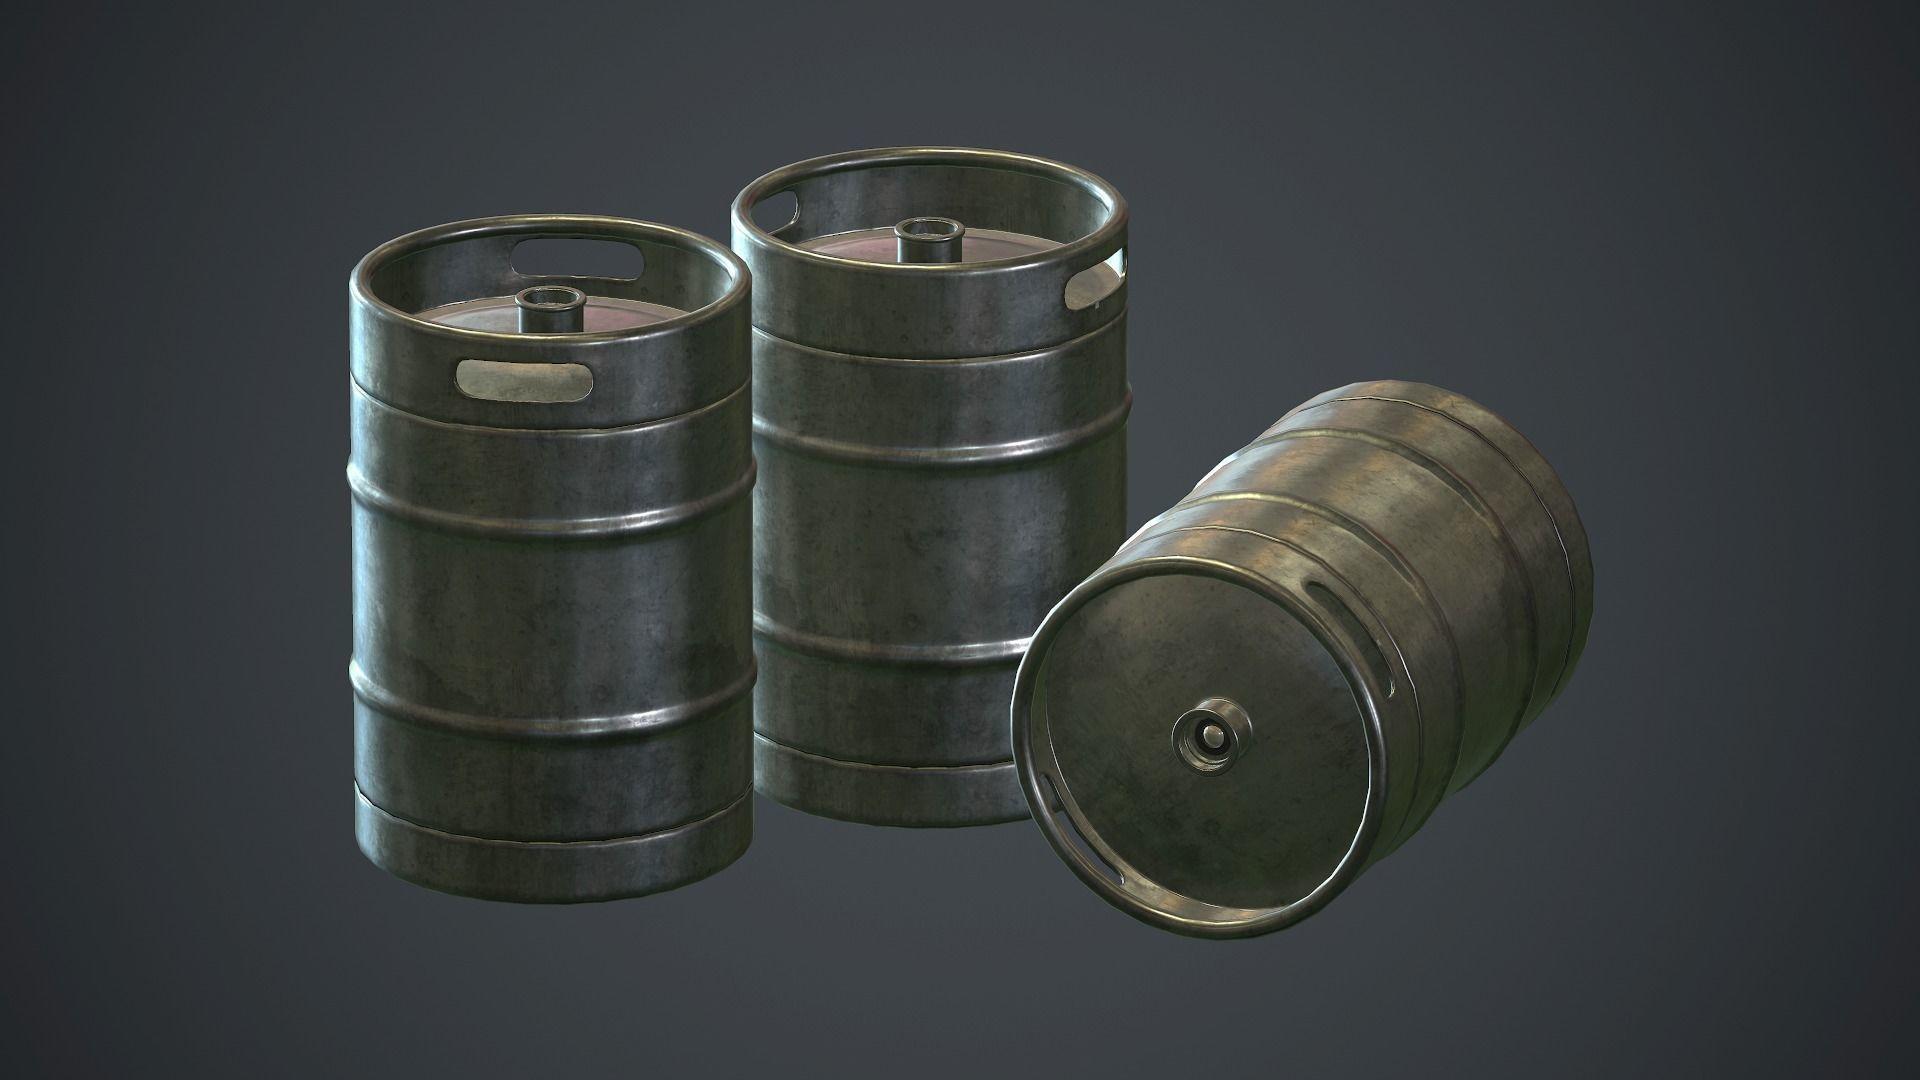 Stainless Steel Beer Keg PBR Game Ready